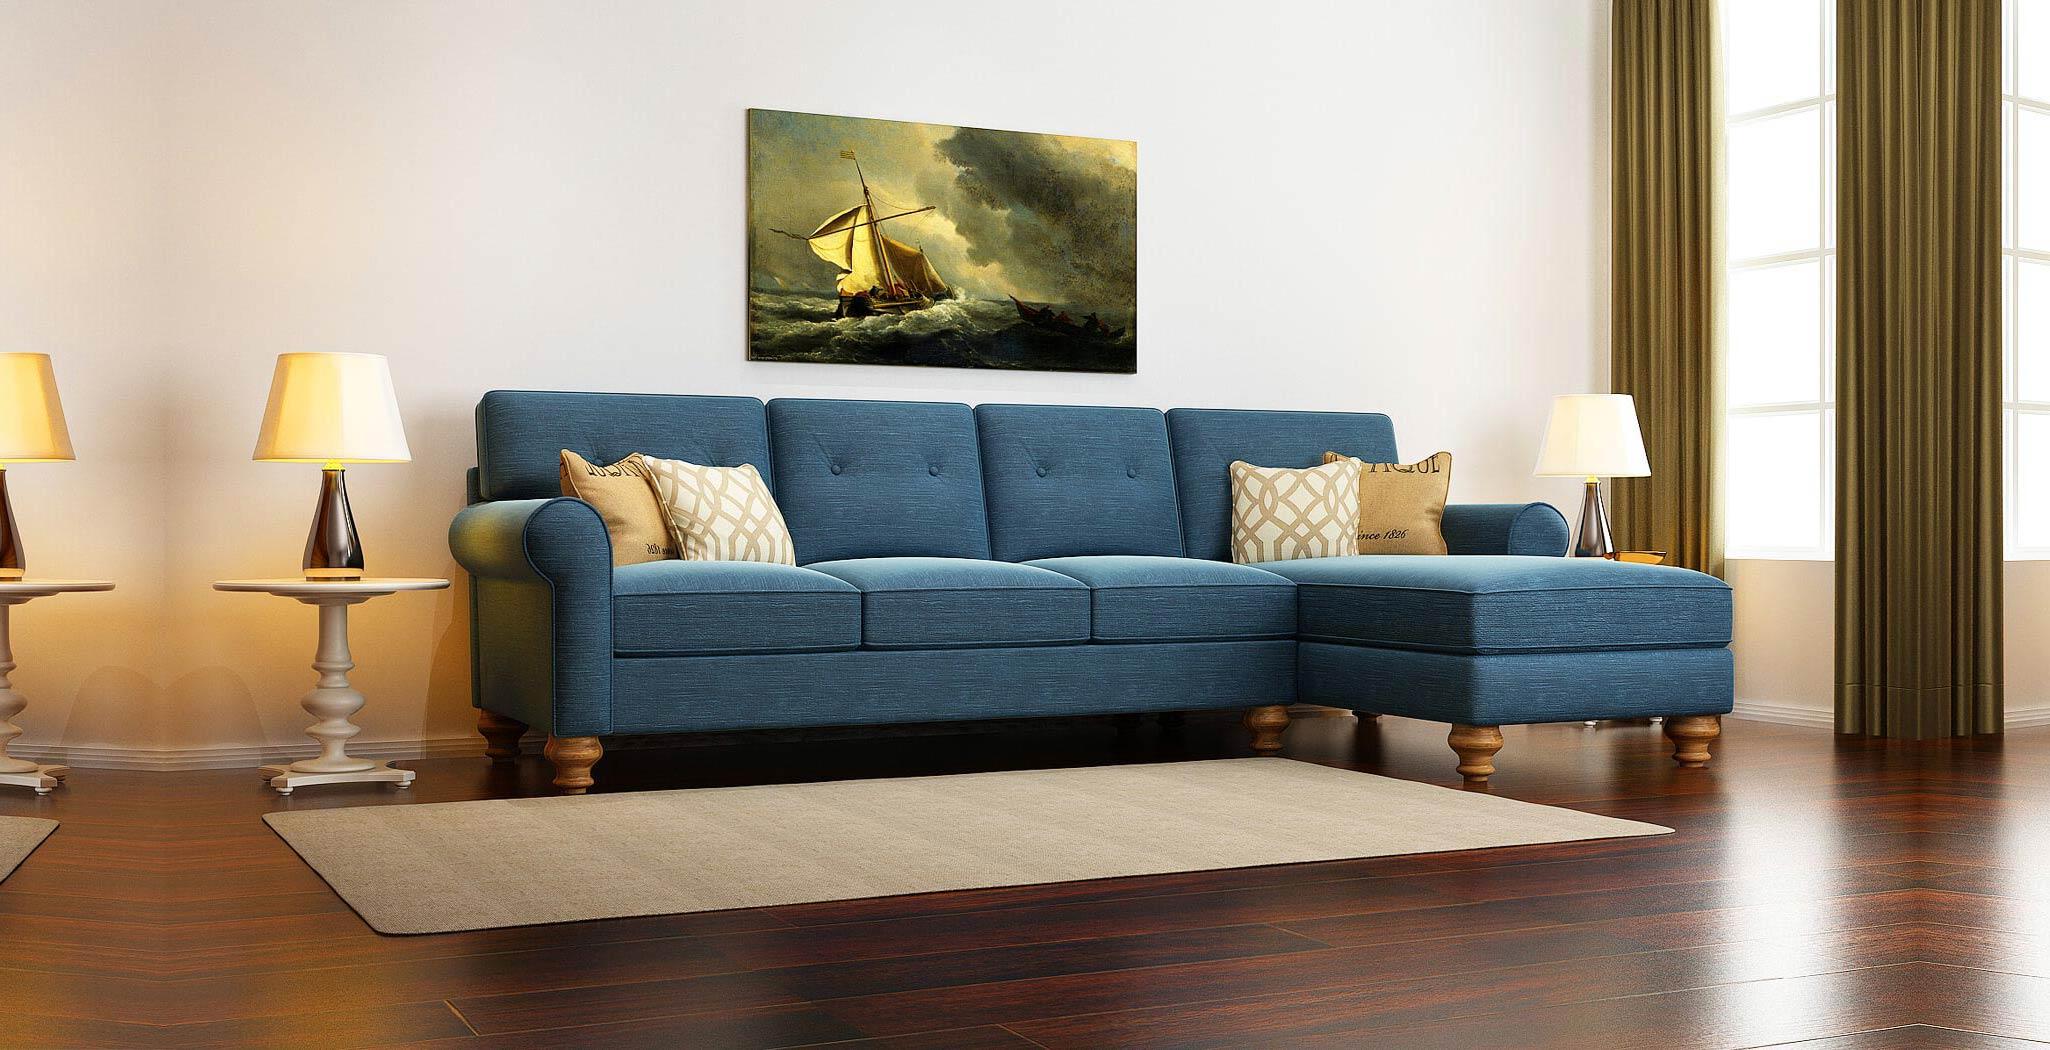 farah panel furniture gallery 2